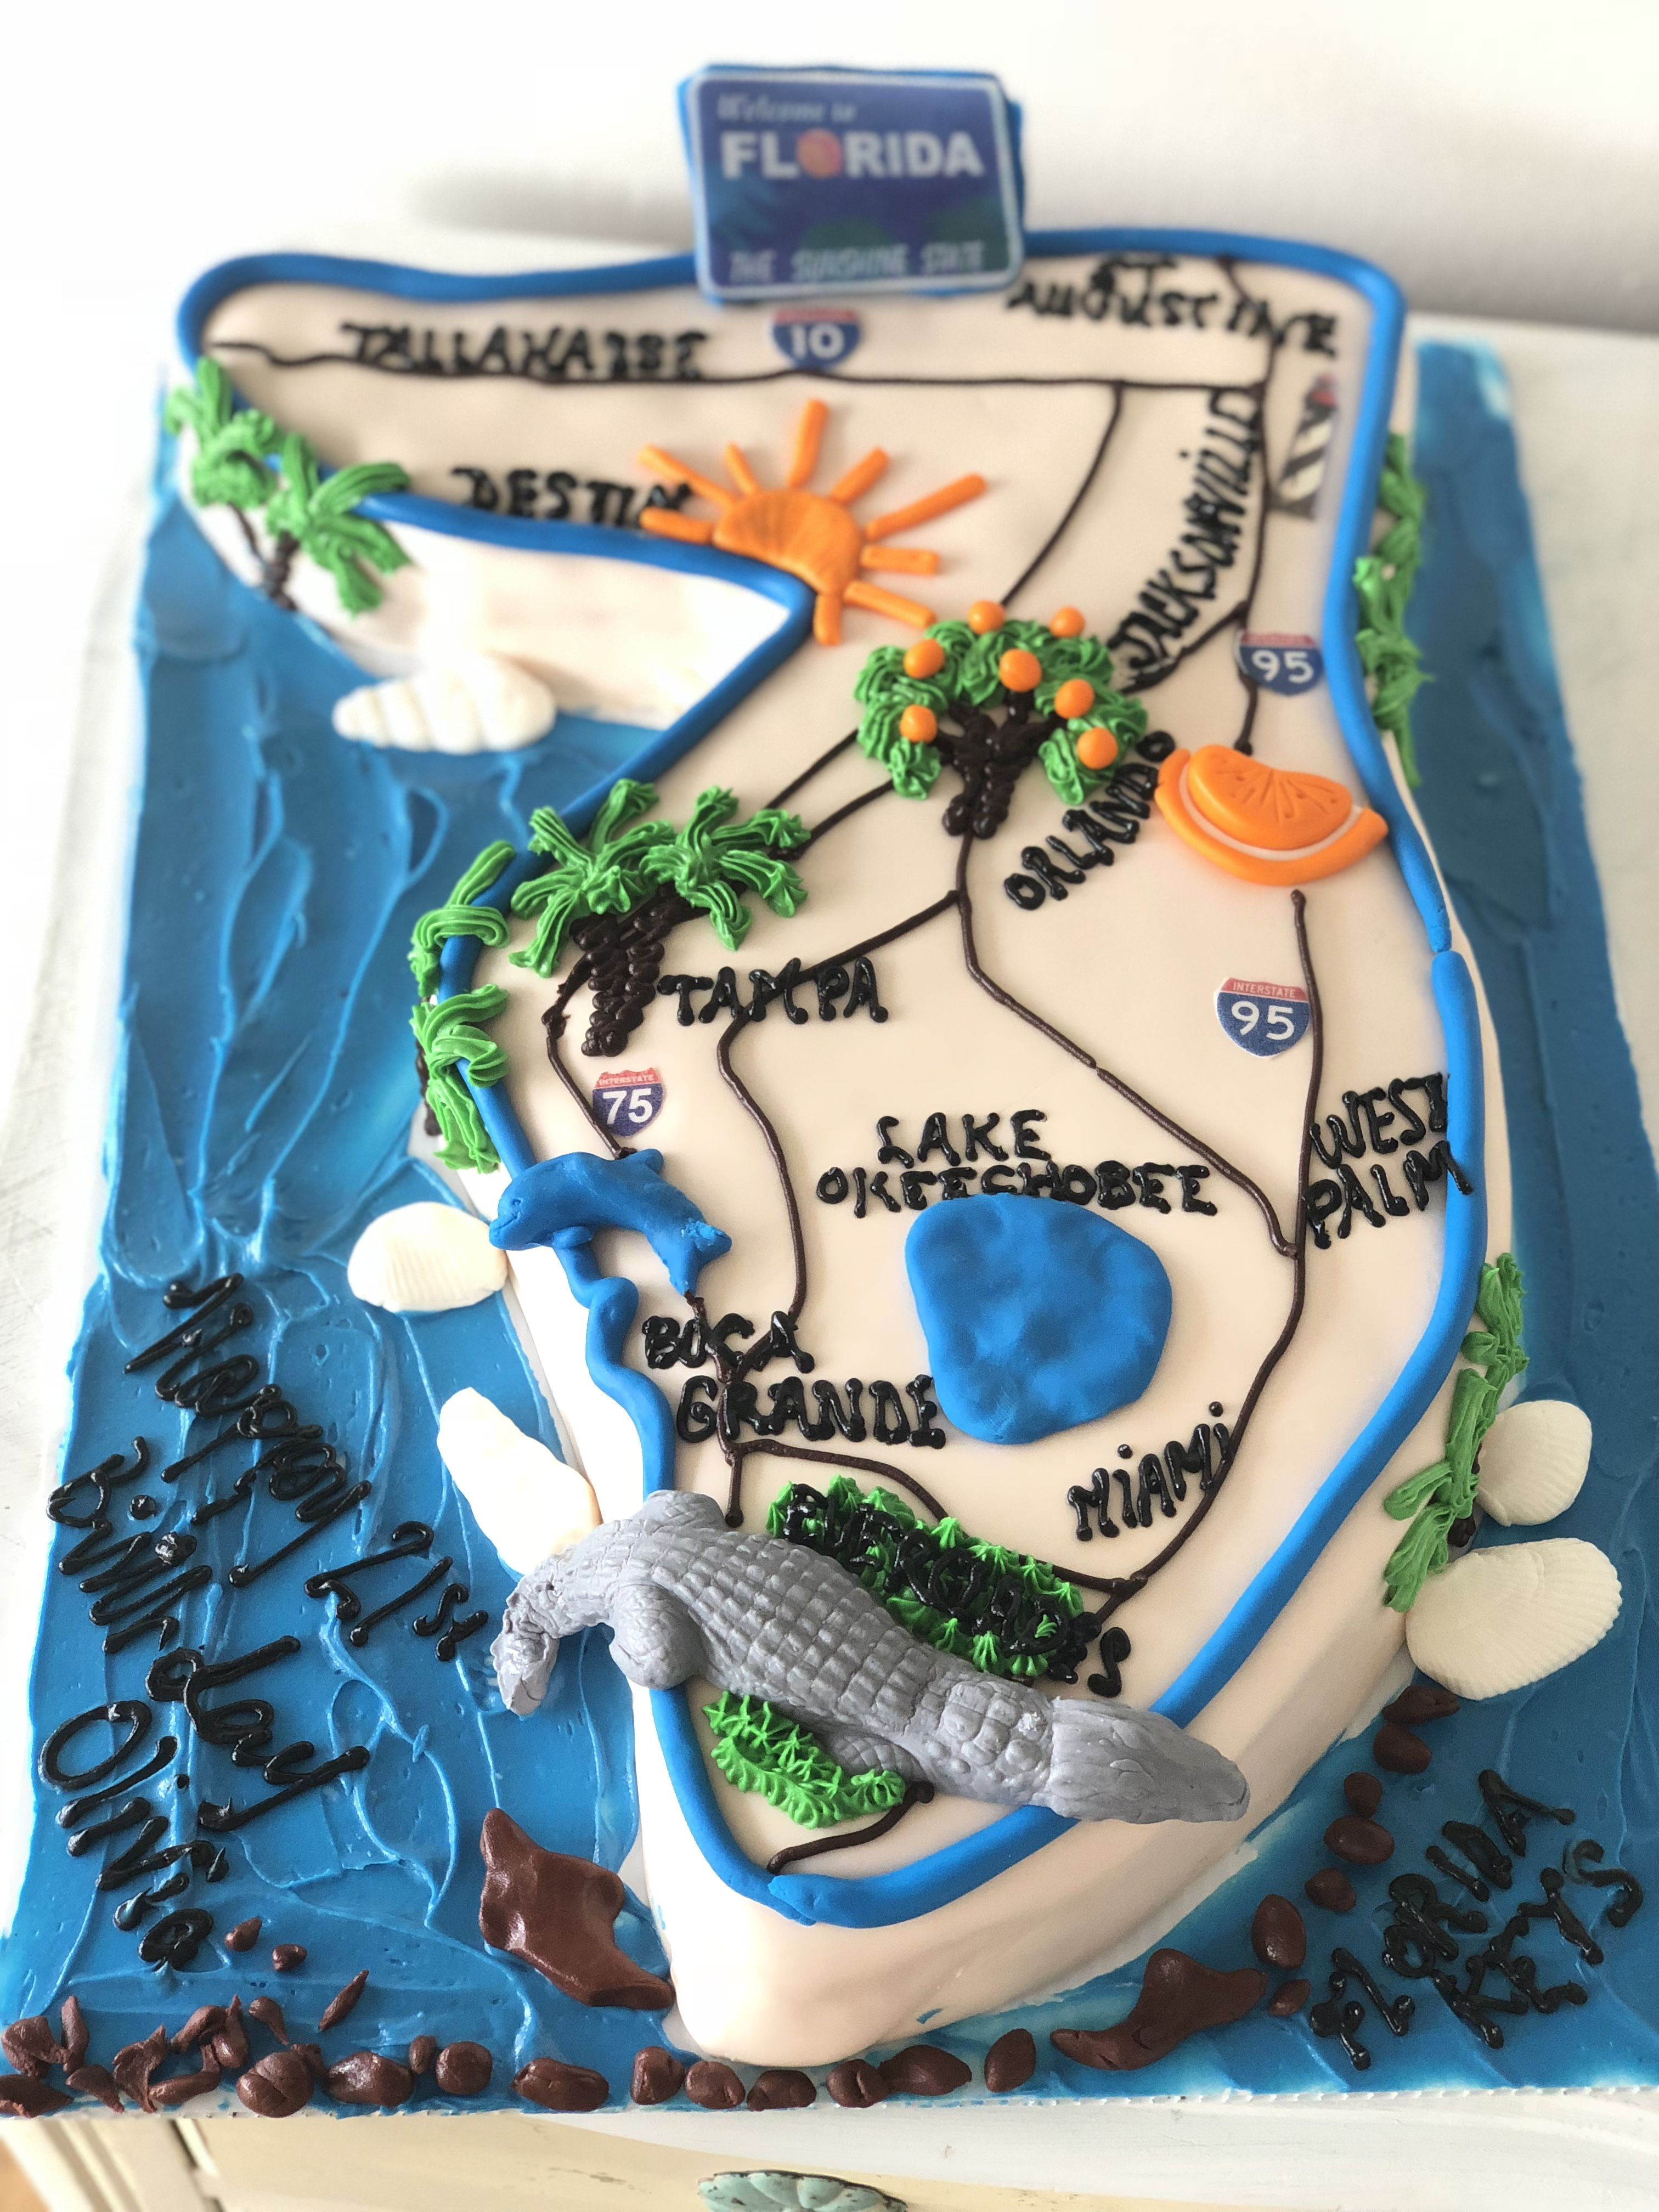 State of Florida birthday cake | Birthday | Wedding cake bakery ...